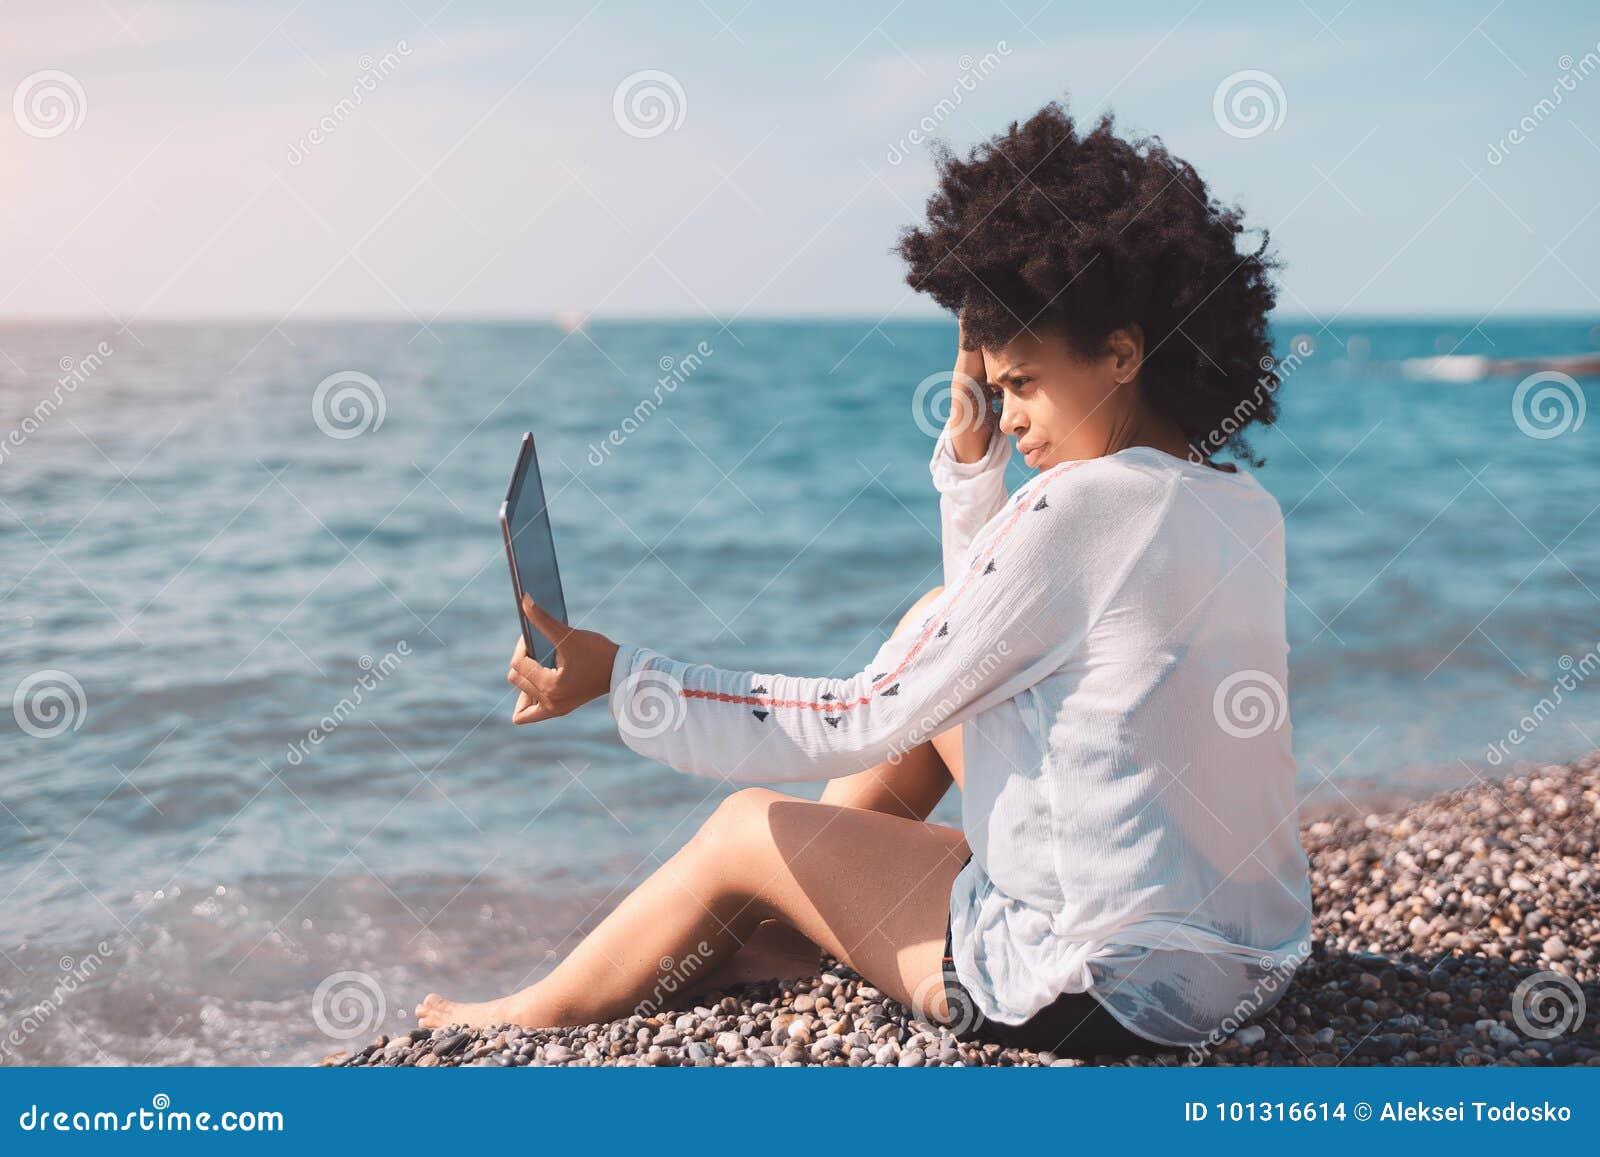 Black Girl On The Beach Taking Selfie Stock Photo Image Of